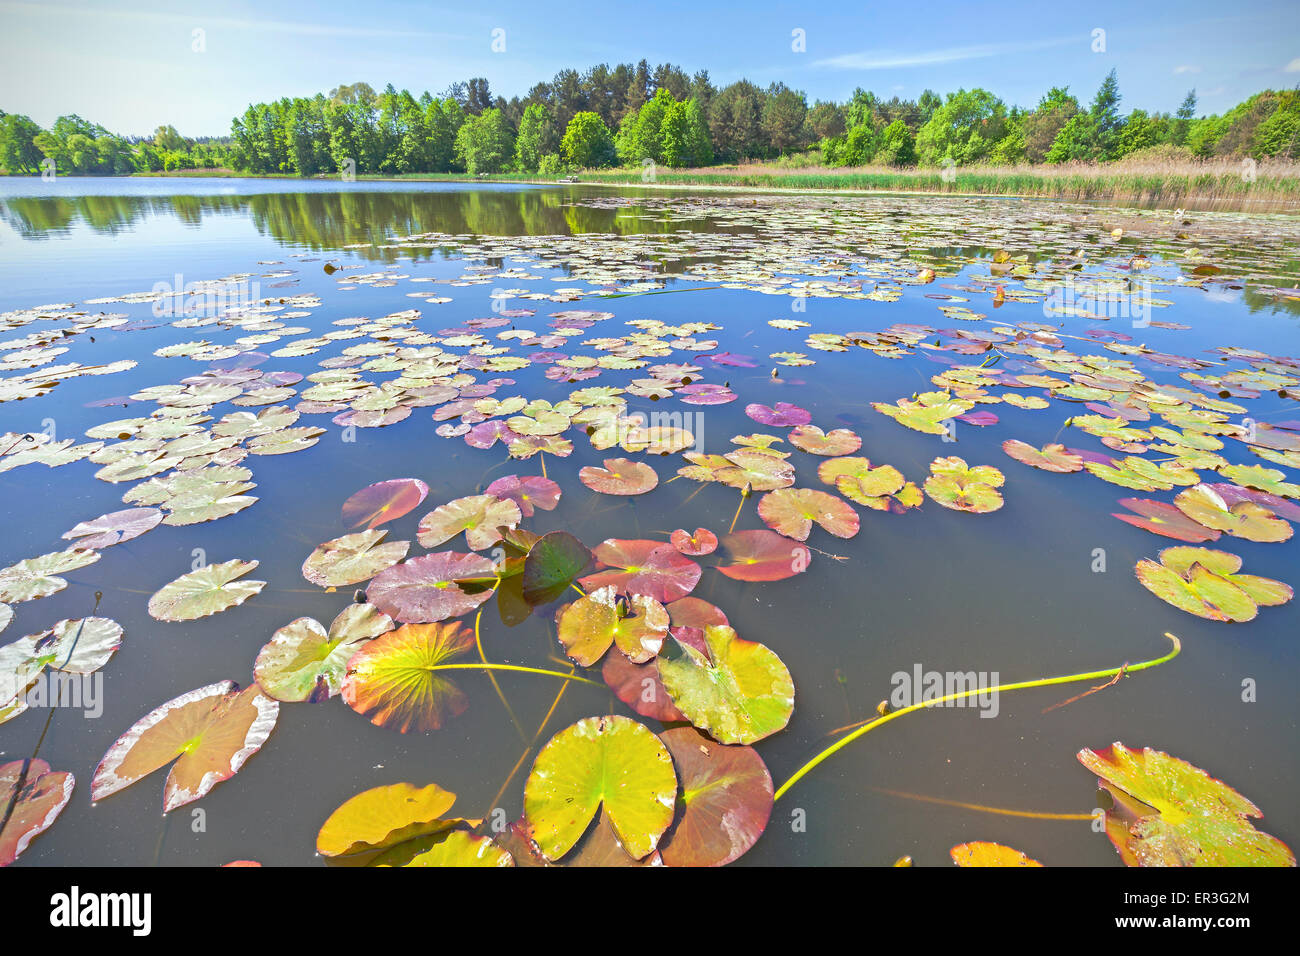 Nenúfares, gran angular con vistas al lago en verano. Imagen De Stock